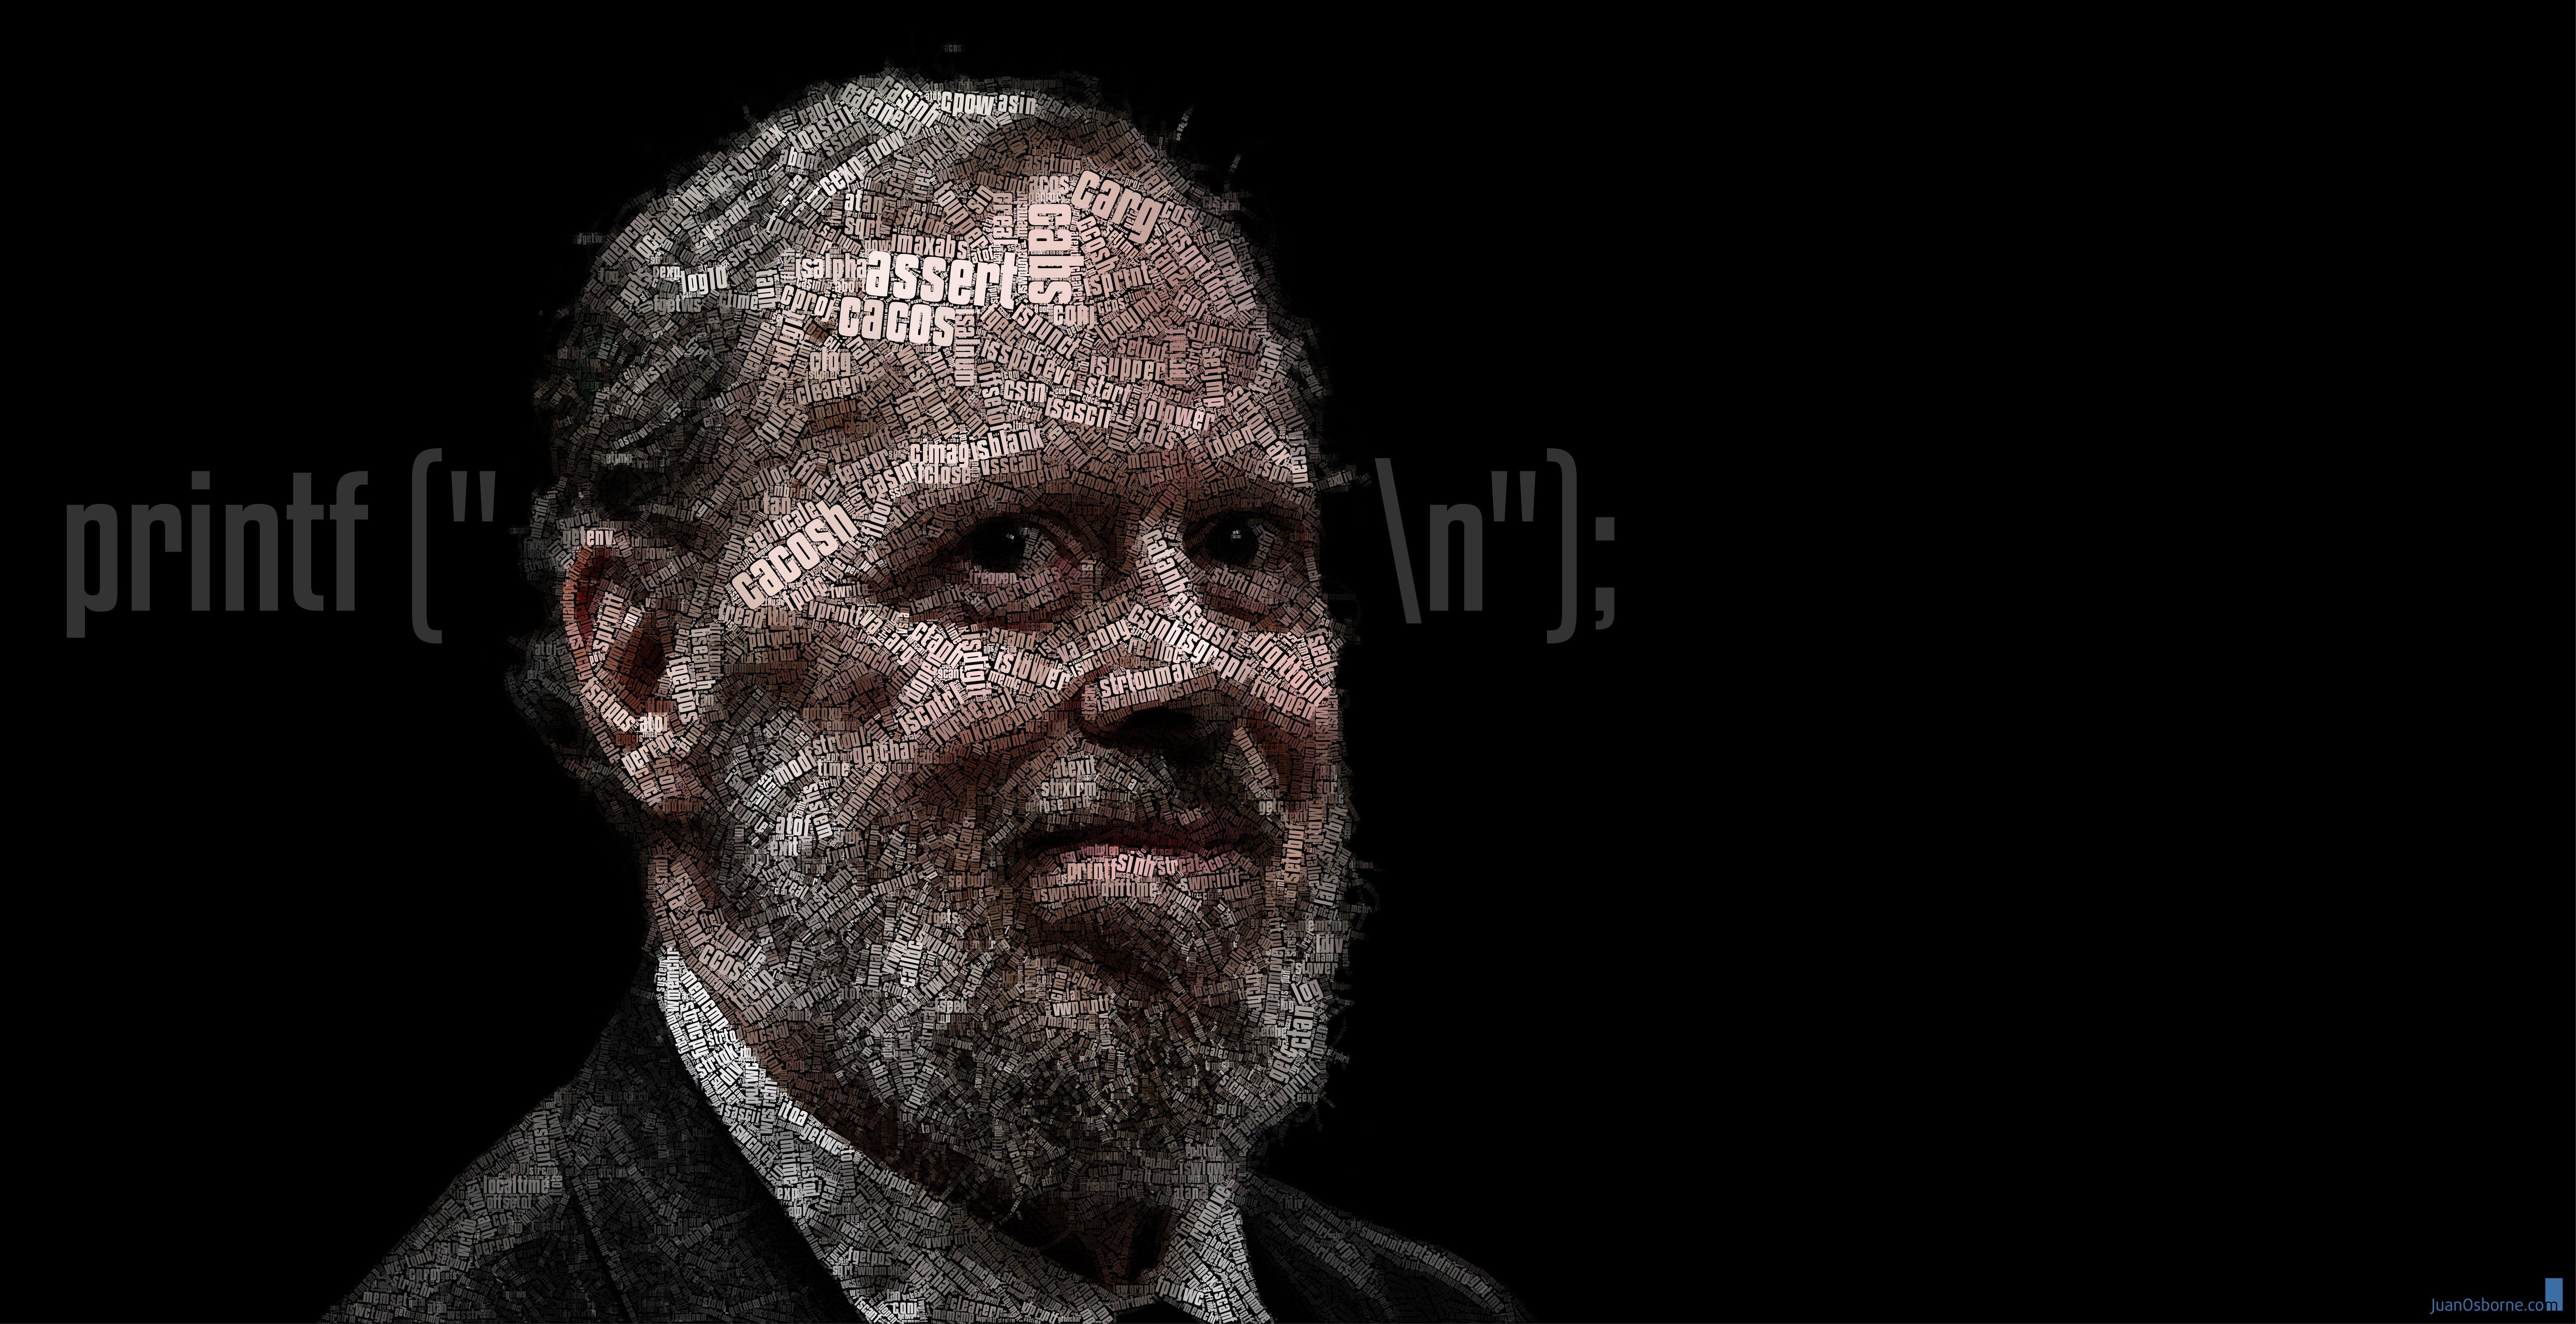 Dennis Ritchie's quote #3